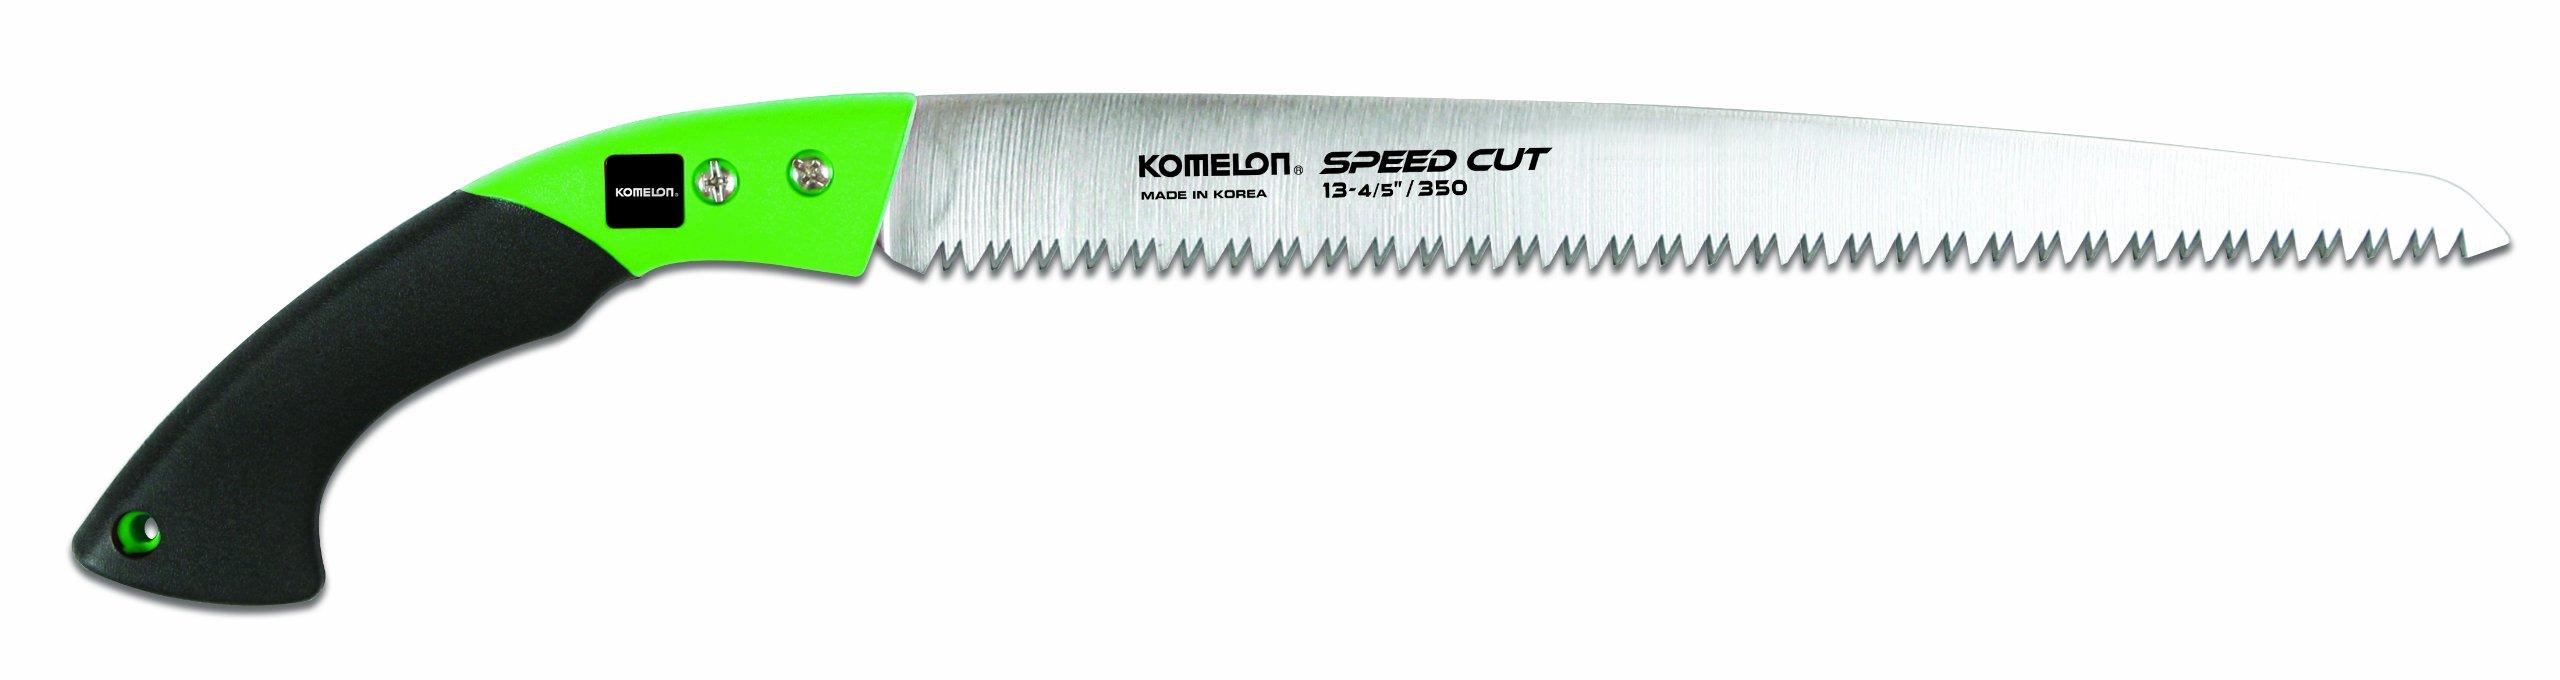 Komelon Speed Cut Straight Pruning Saw, 13-4/5-Inch